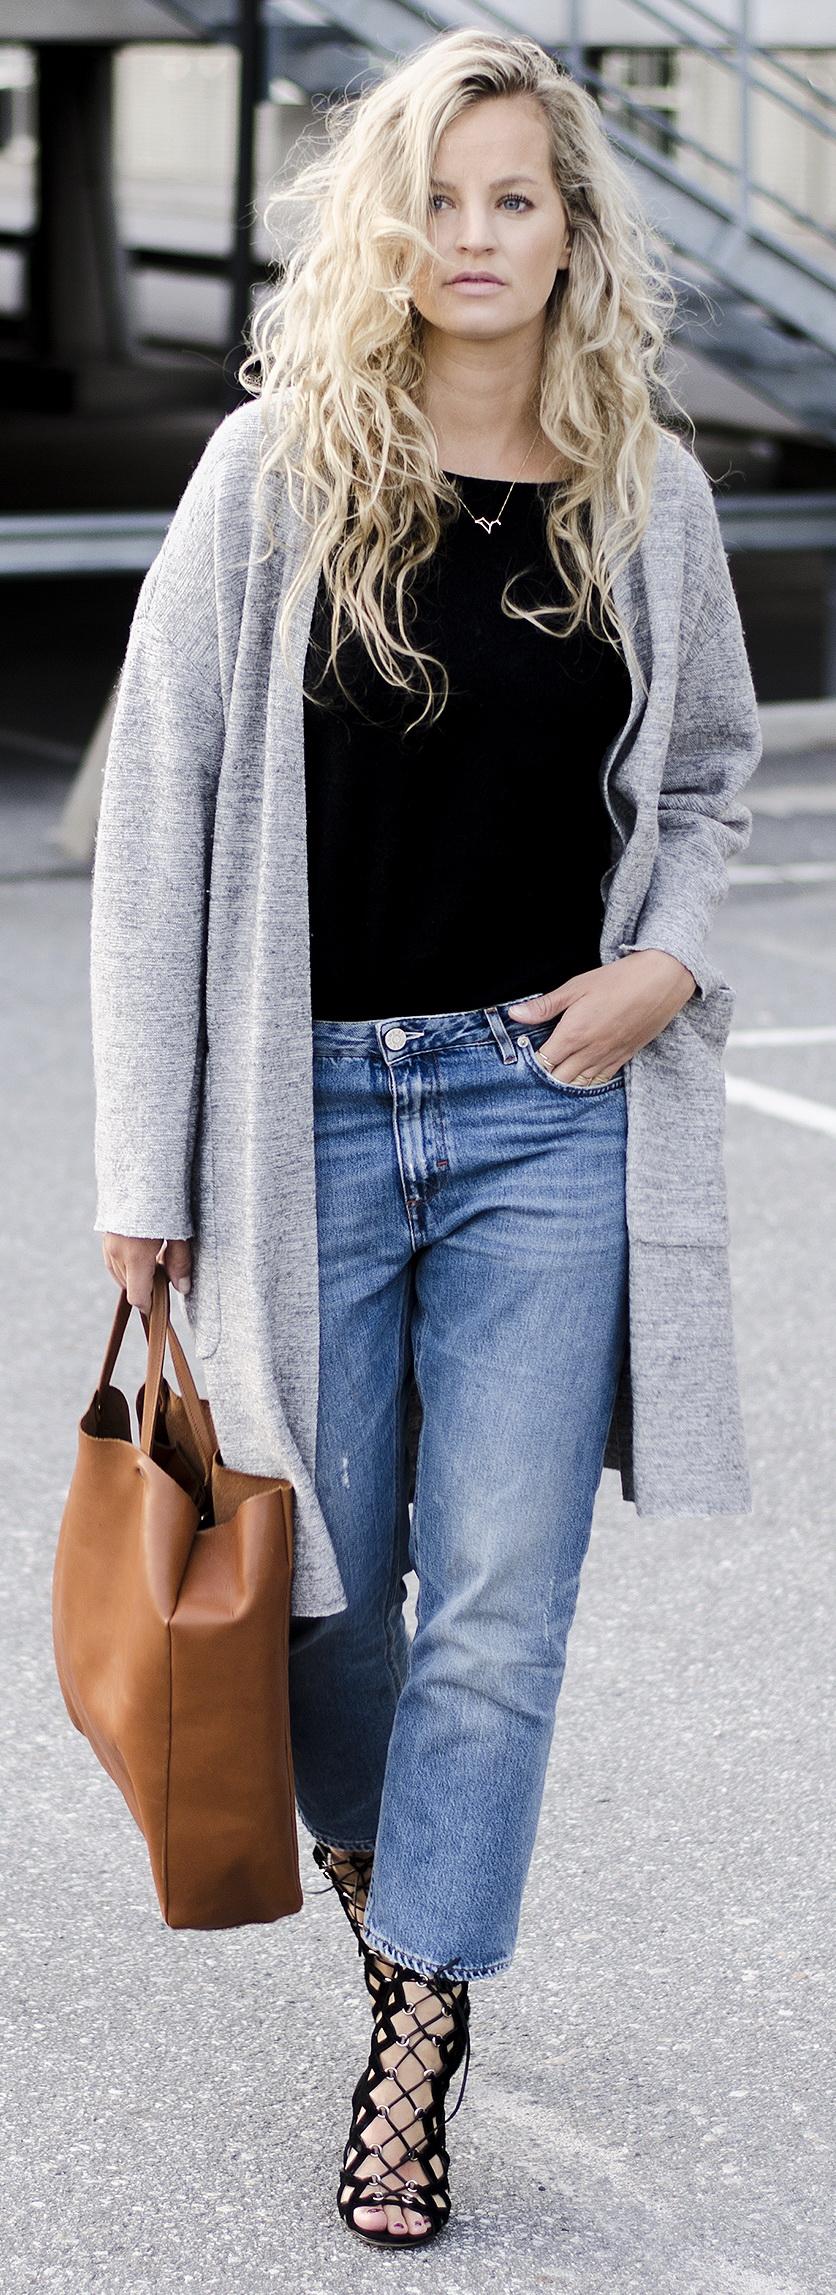 Vest – SET Fashion // Jeans – Acne Studios // Bag – Sandqvist // Heels – Gianvito Rossi // Jewelry – Euna Joyce // Top – Ganni